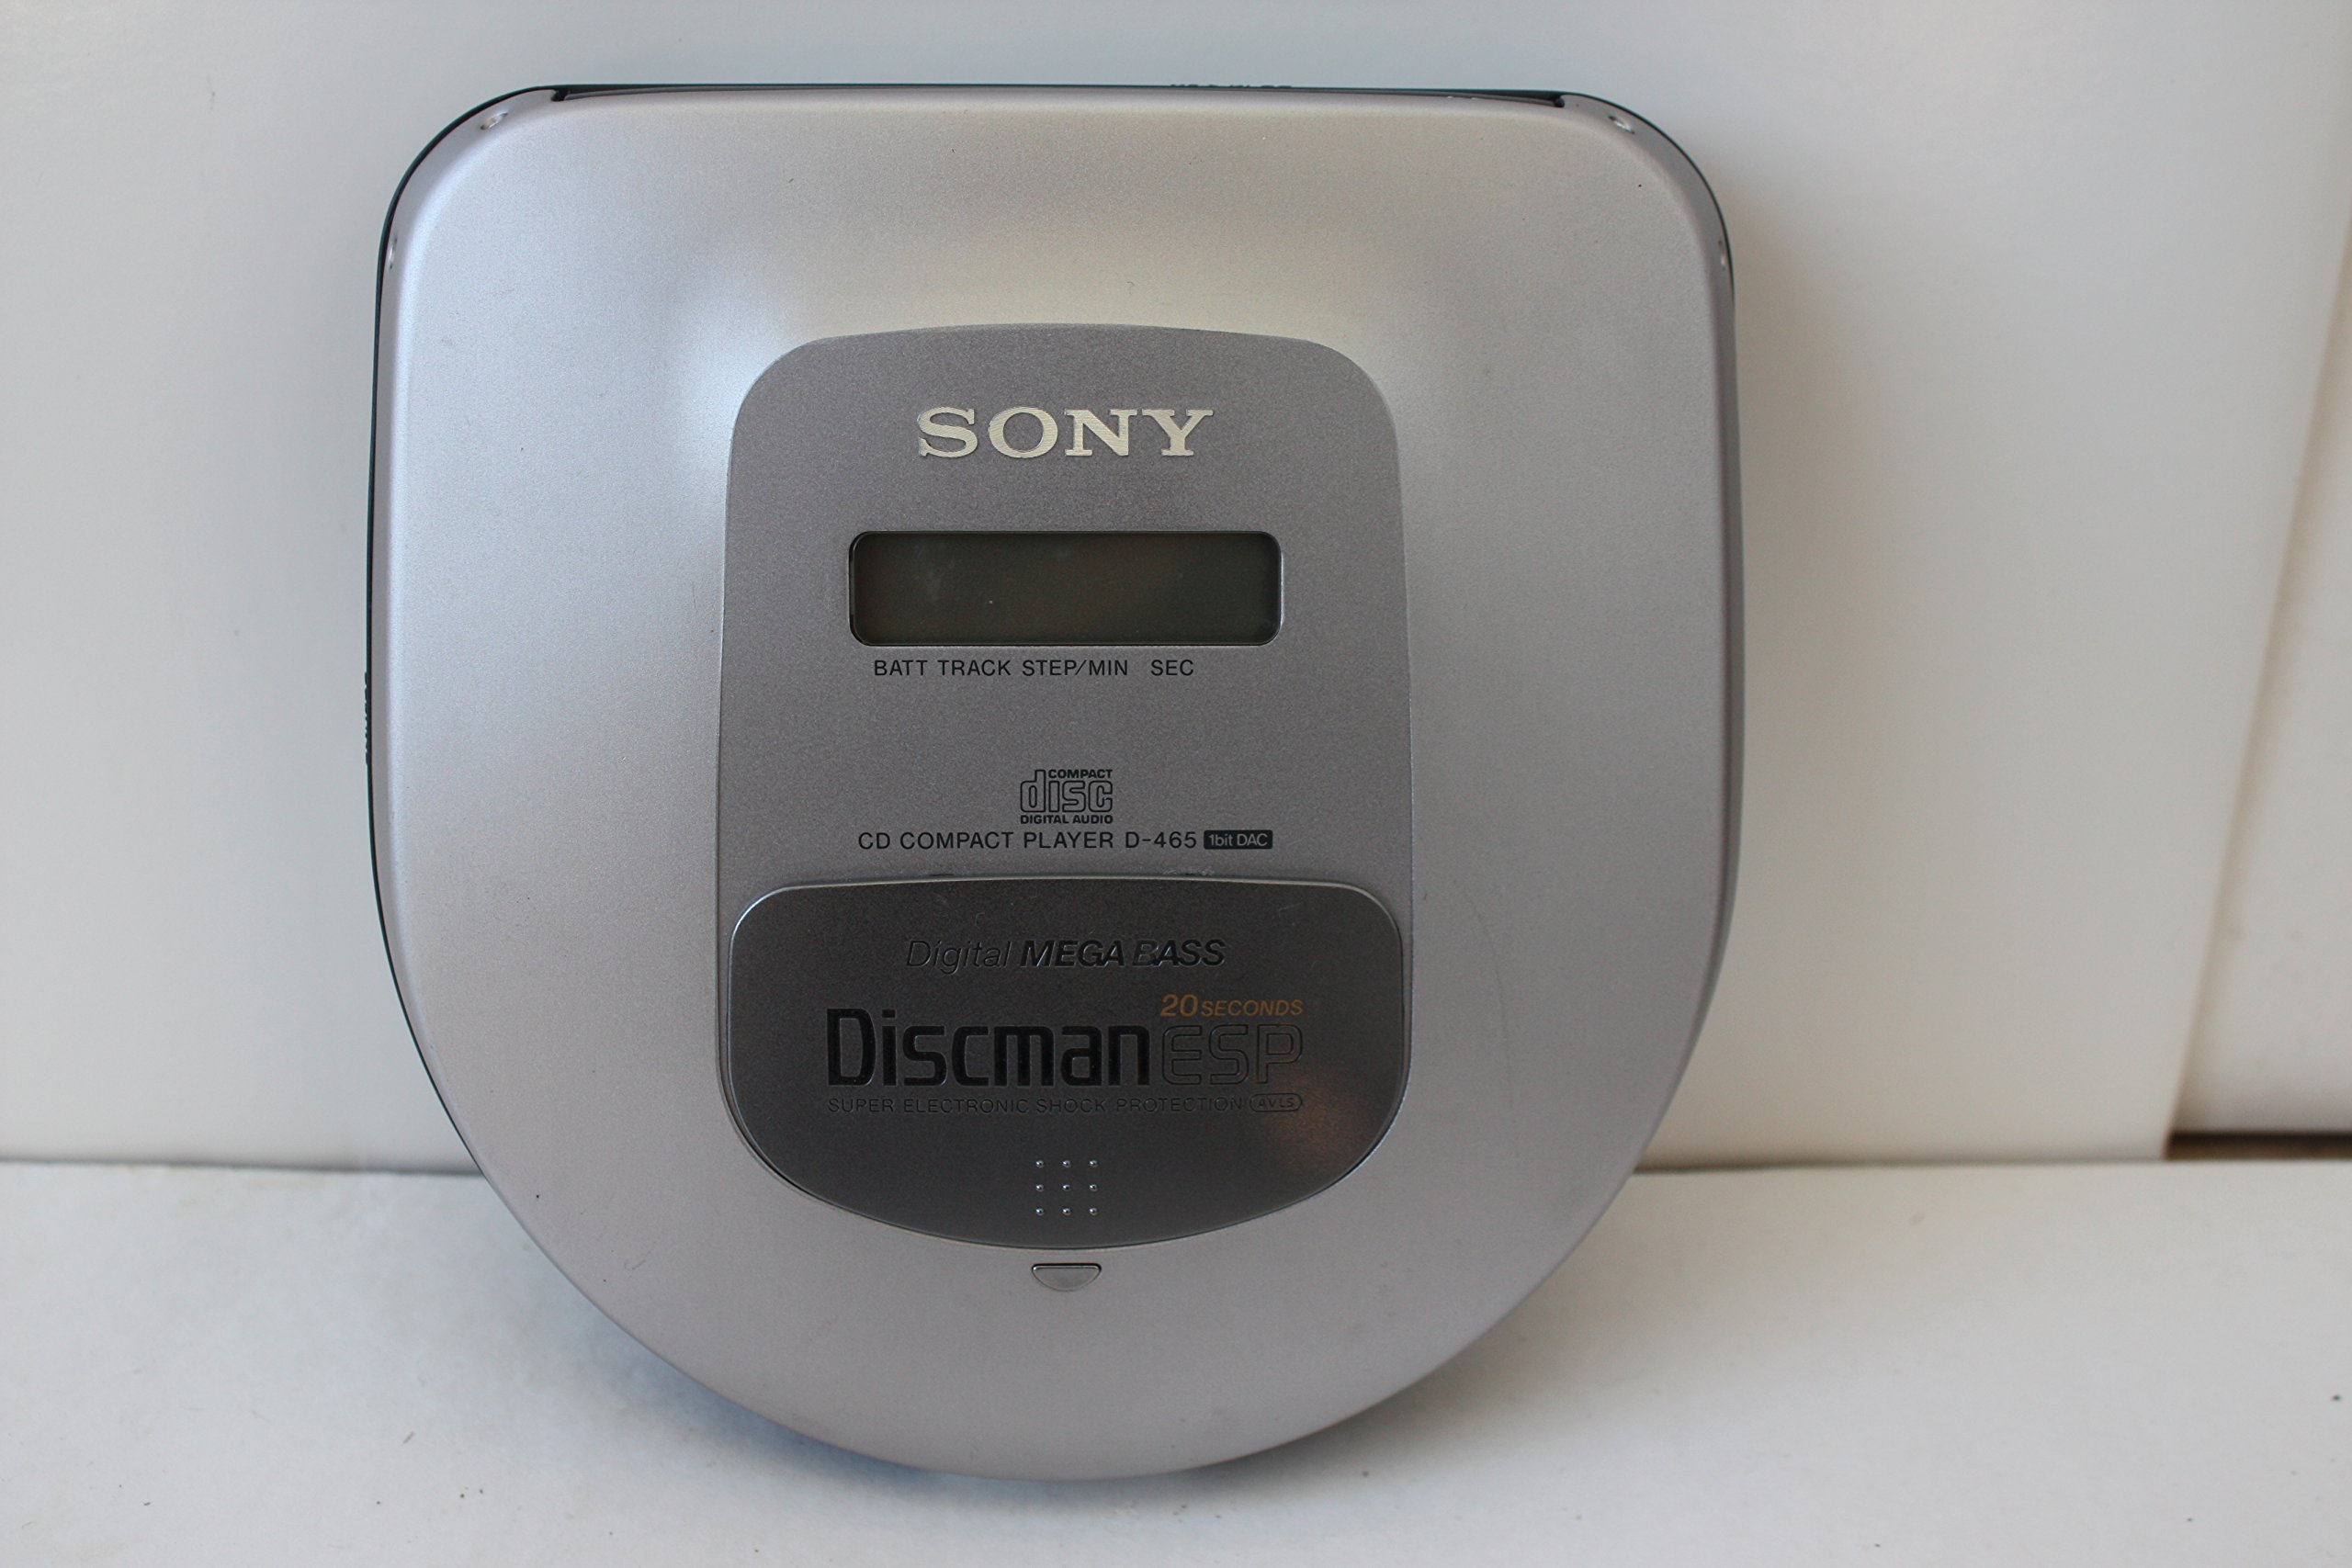 Sony Corp. Sony D-465 Sony CD Compact Player D-465 1bit DAC Digital MEGA BASS Discman ESP 20 Seconds Super Electroninc Shock Protection AVLS Sony CD portable Player Discman Model# D-465